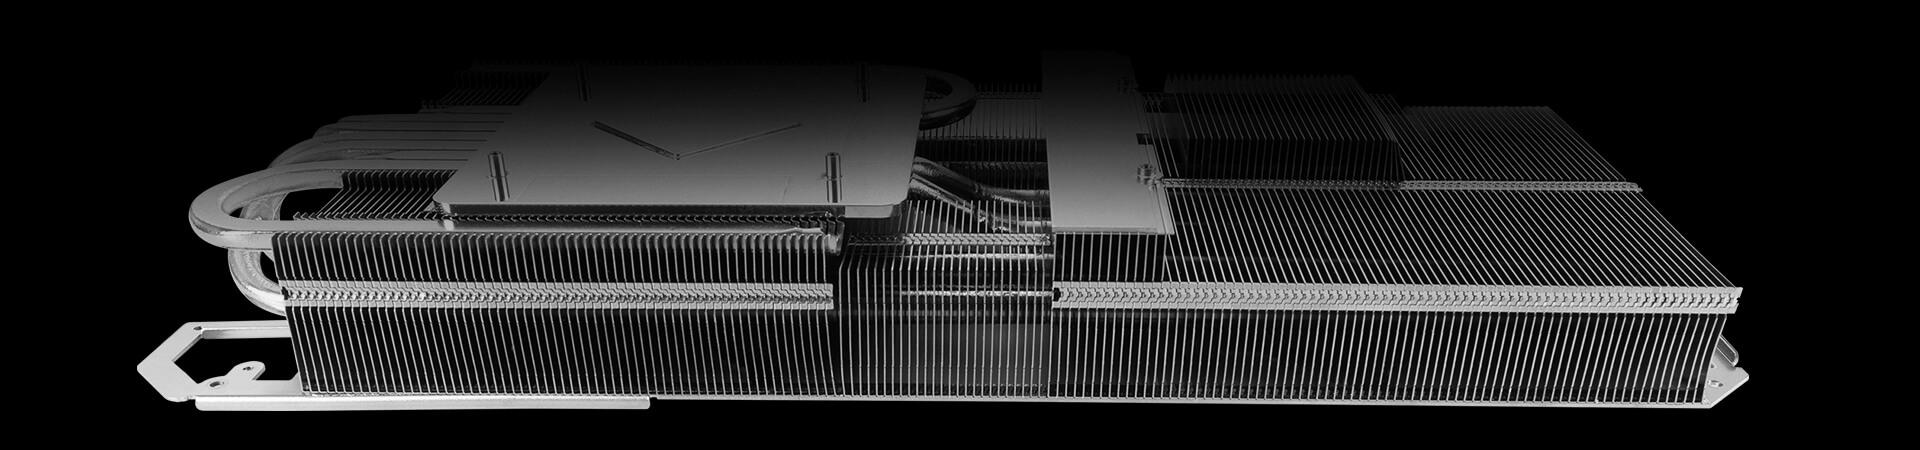 Radeon™ RX 6700 XT